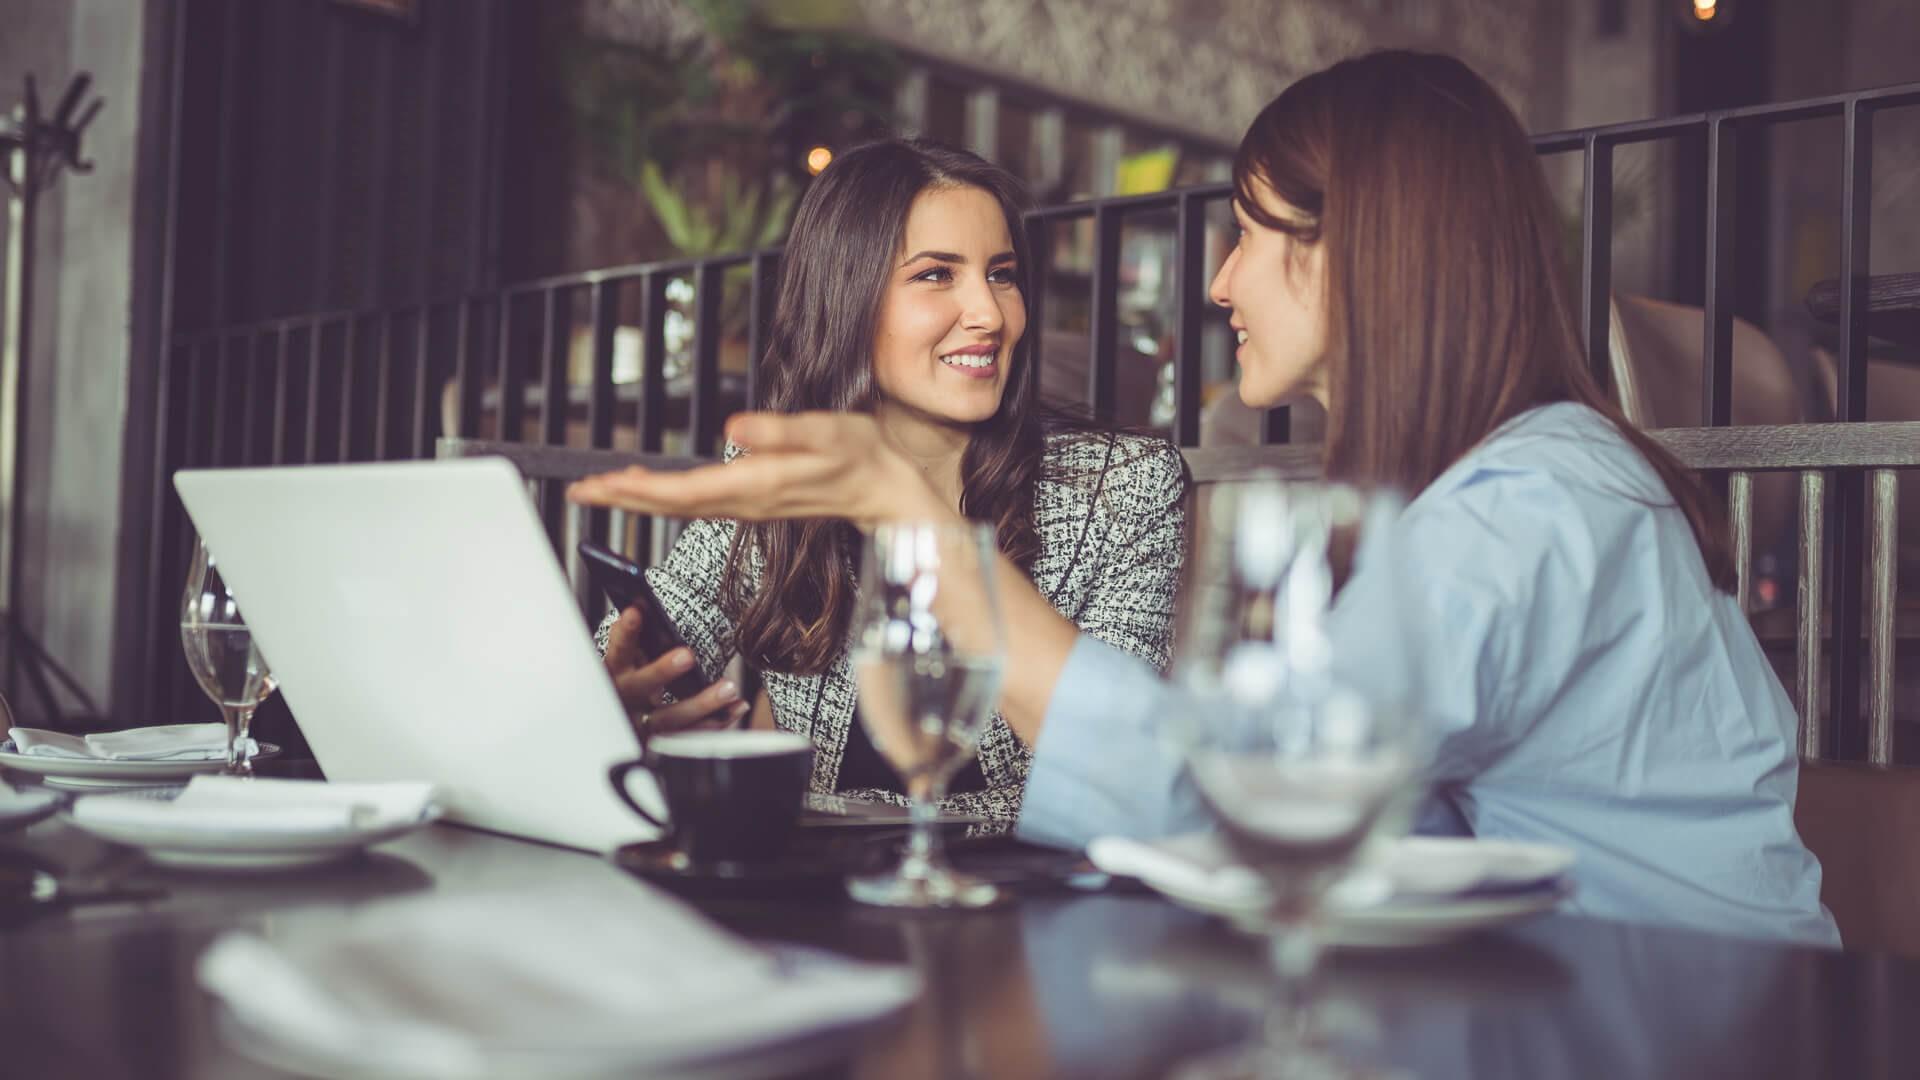 Businesswomen in cafe, using laptop.